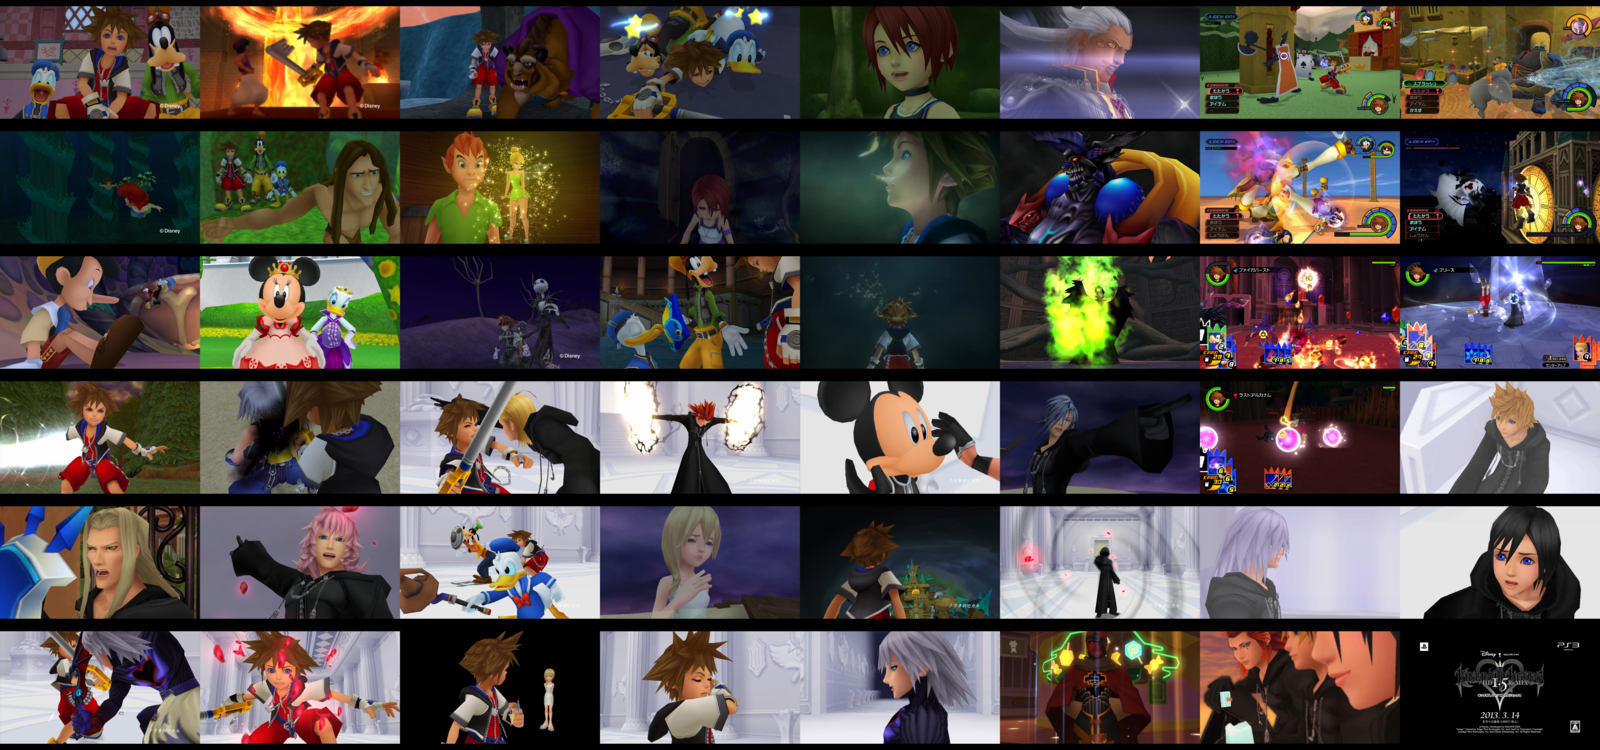 Kingdom Hearts 25 Wallpaper E3 2014 kingdom hearts hd 25 1600x750